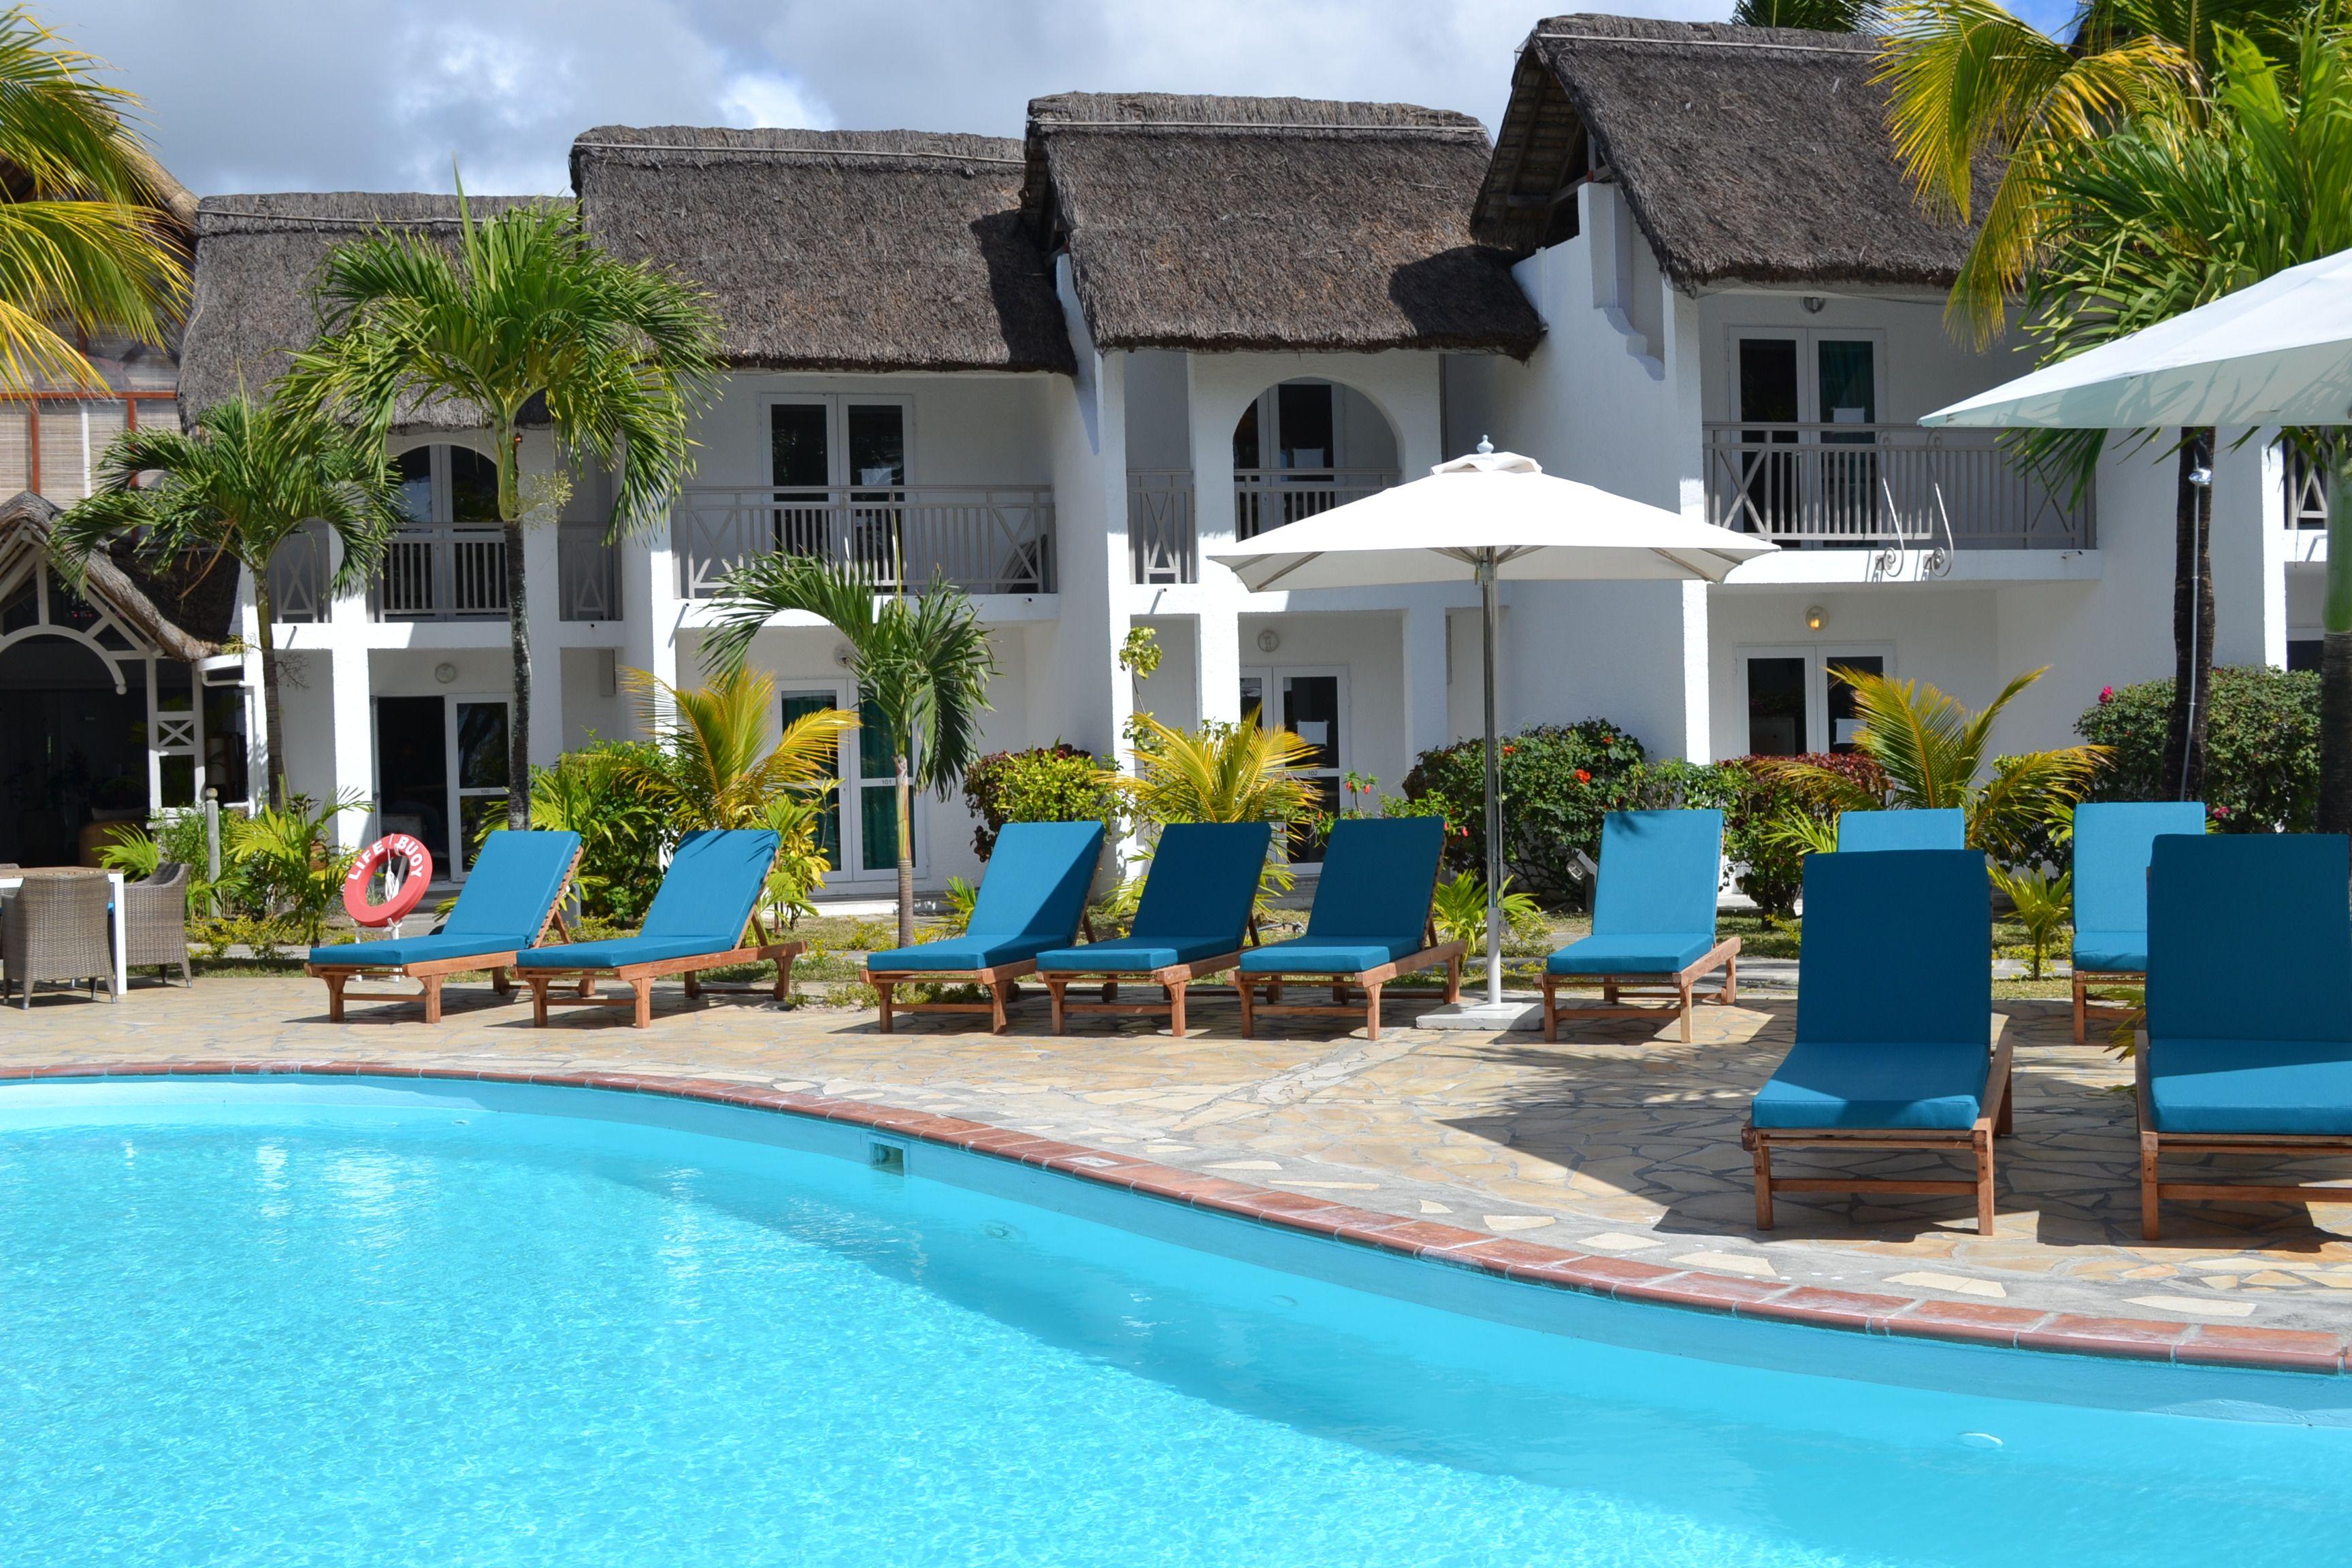 The Swimming Pool Area At Veranda Palmar Beach Mauritius Palmar Beach Swimming Pools Pool Area